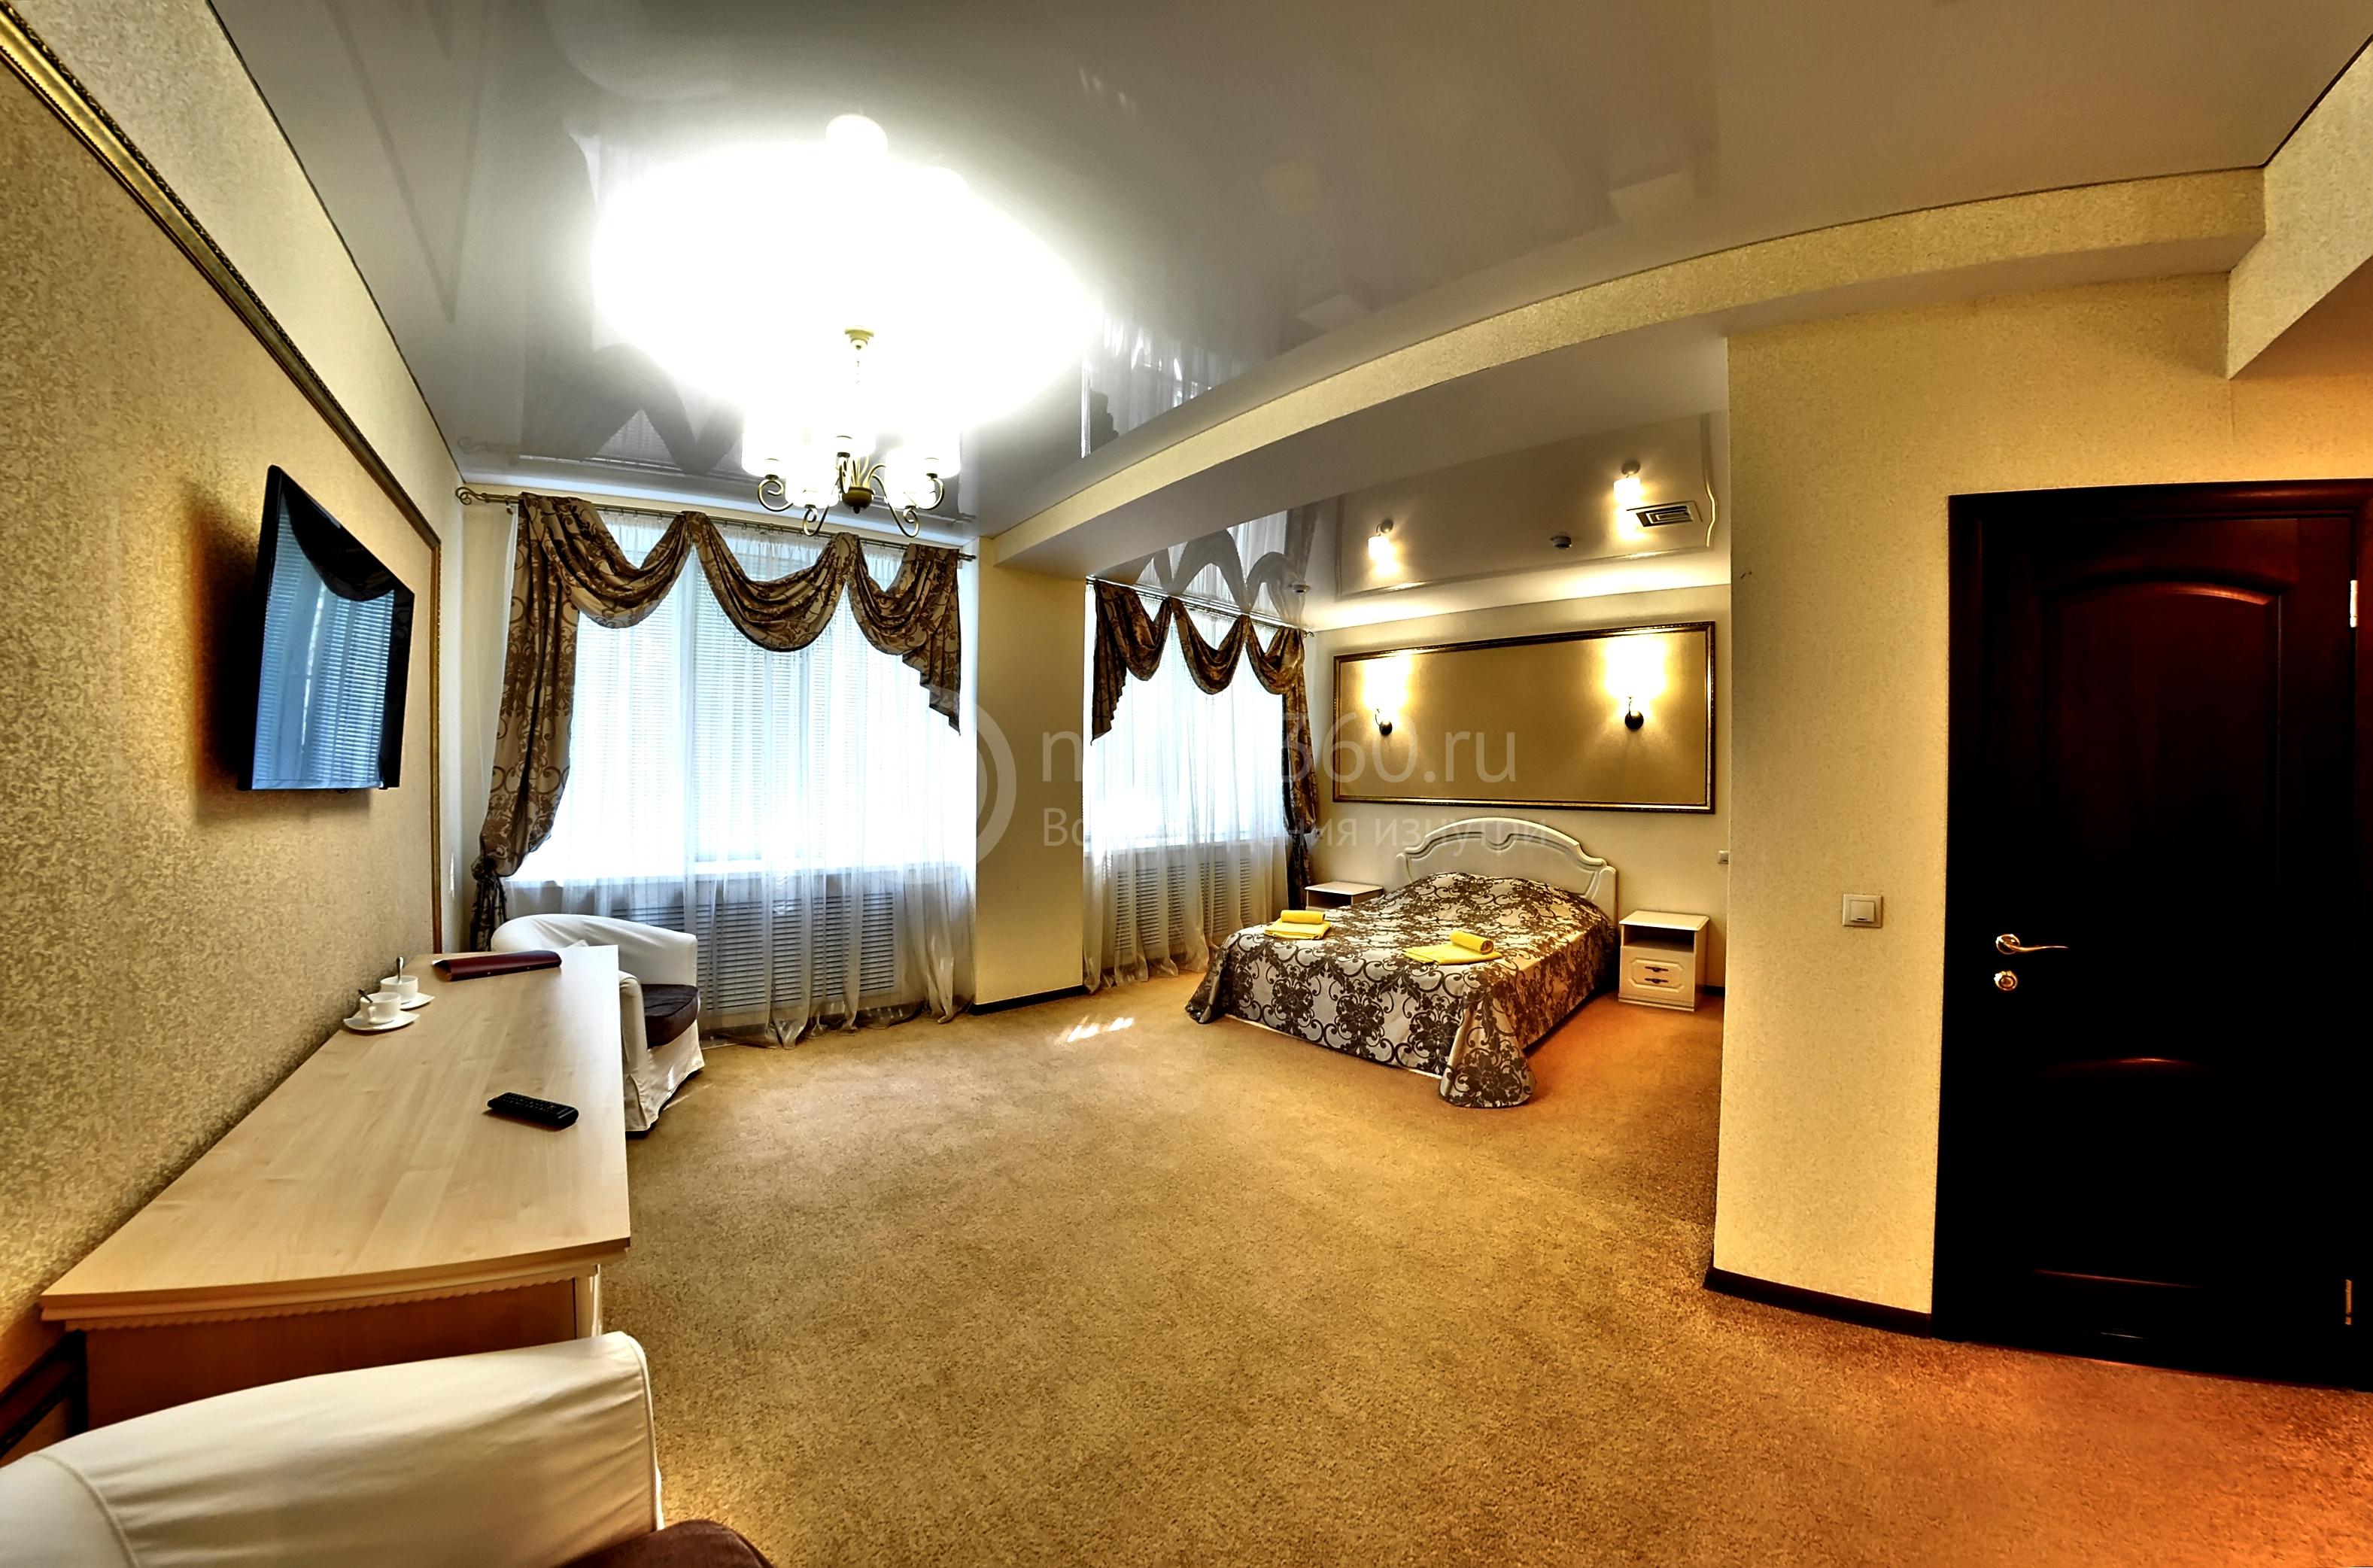 nord house, мини отель